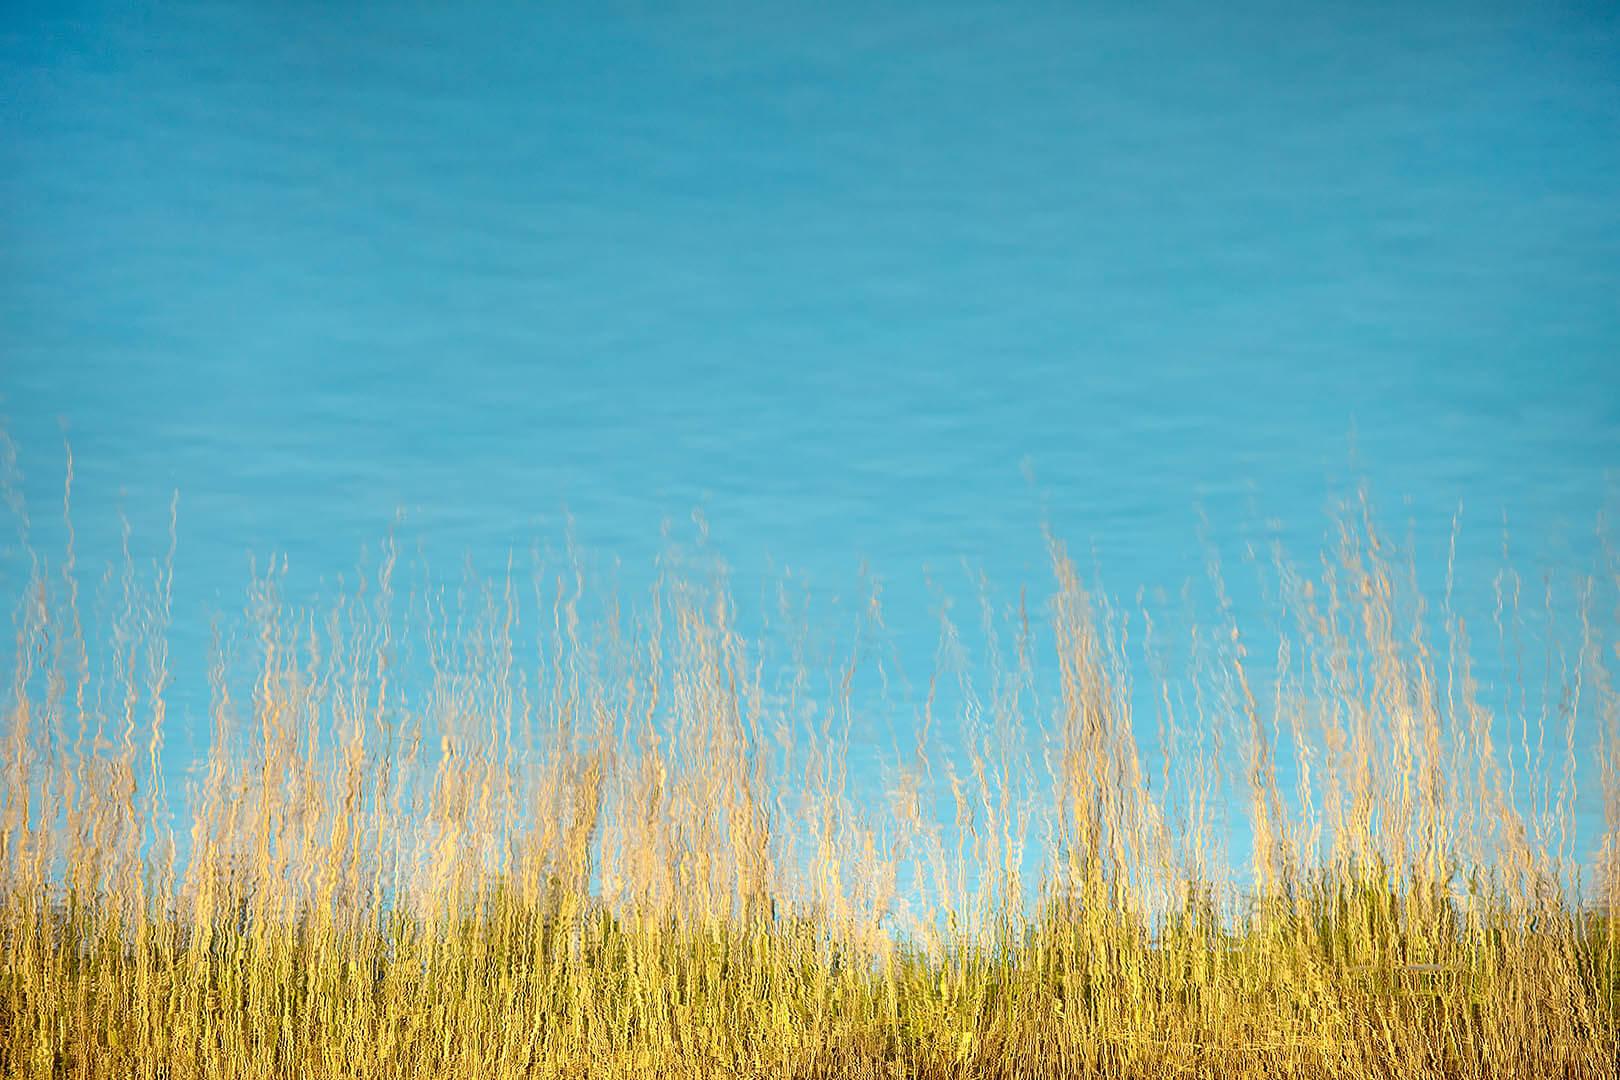 Grass Reflections #1